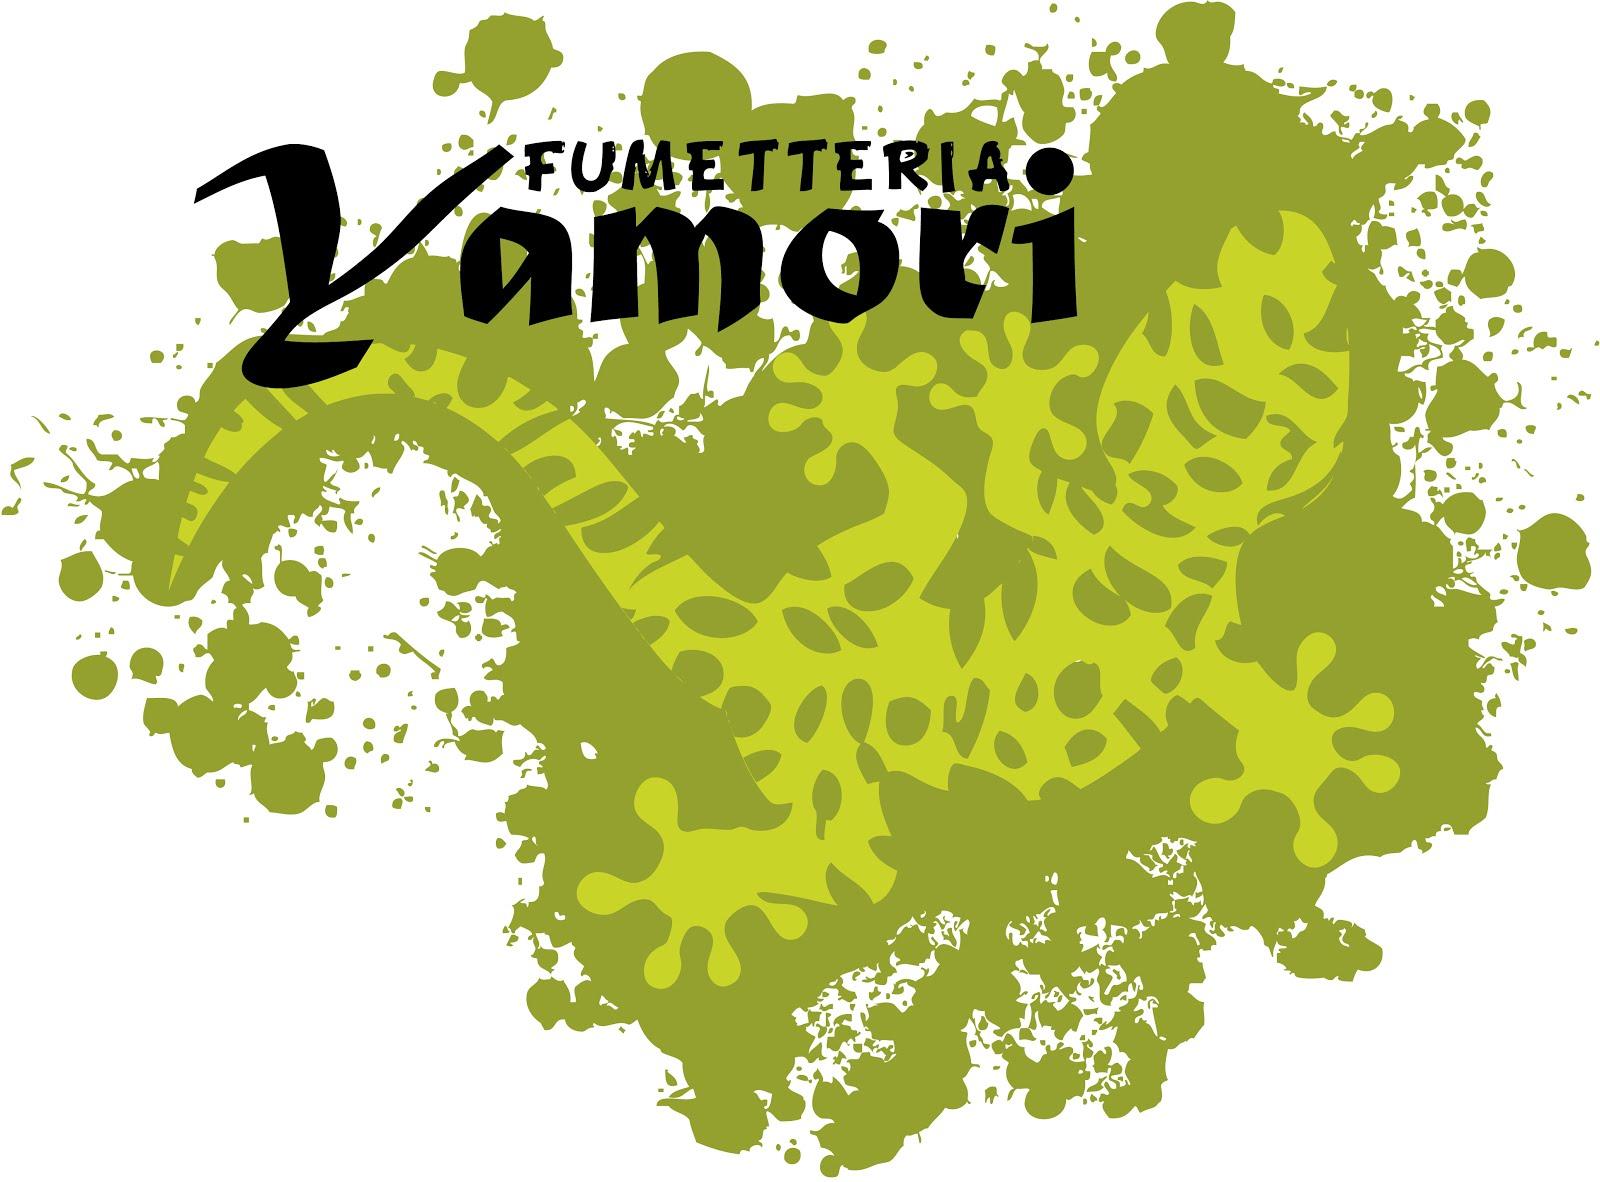 FUMETTERIA YAMORI